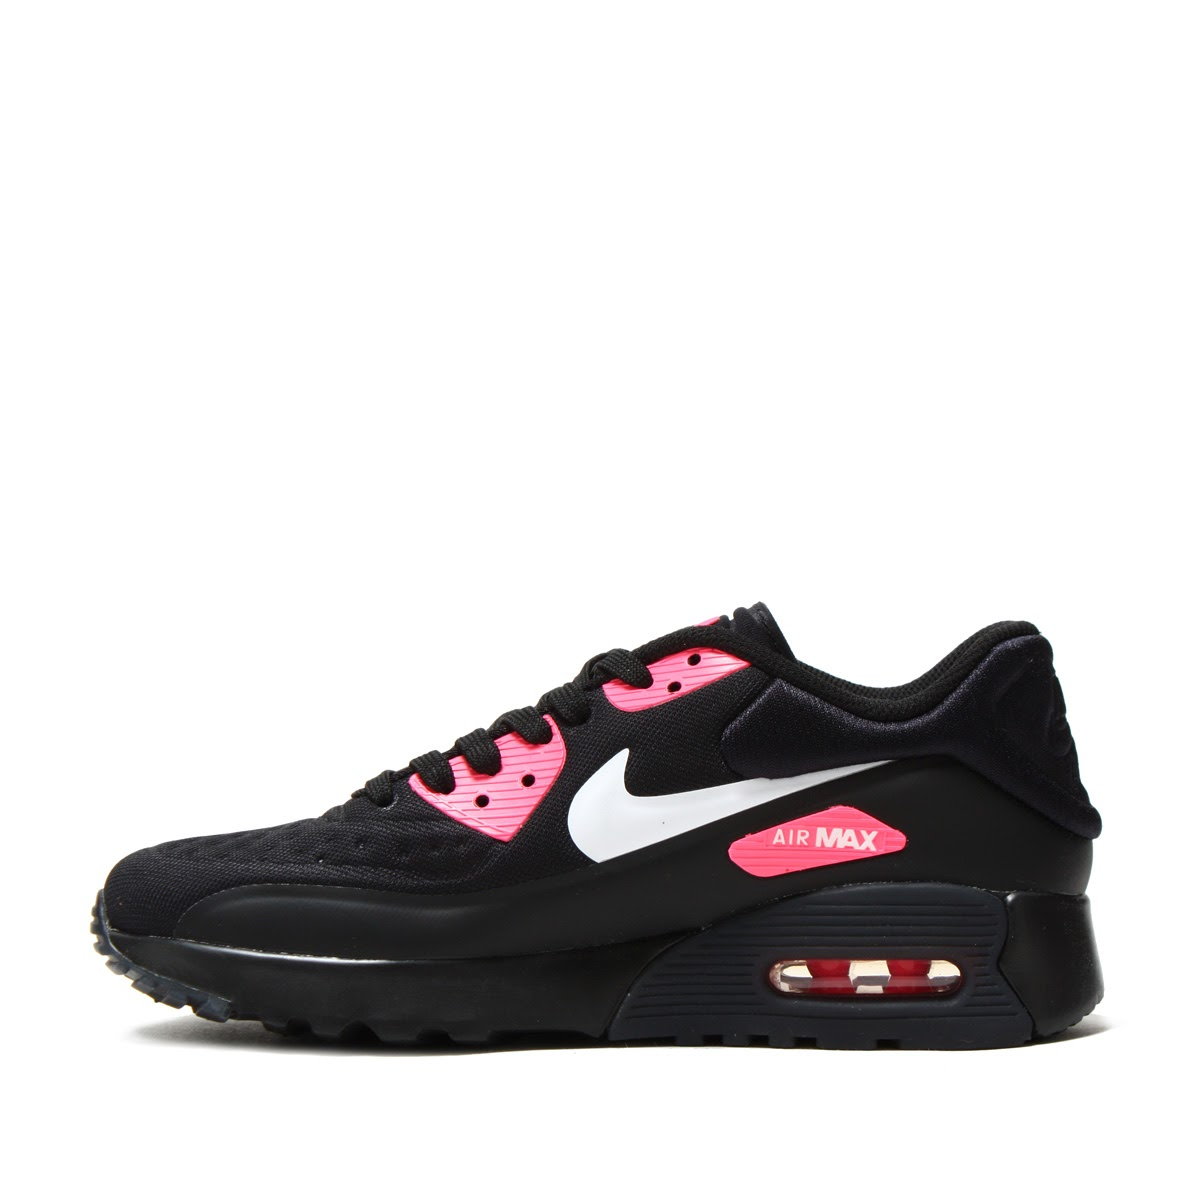 Nike Air Max 90 Ultra SE (GS) Black White Hyper Pink | Footshop